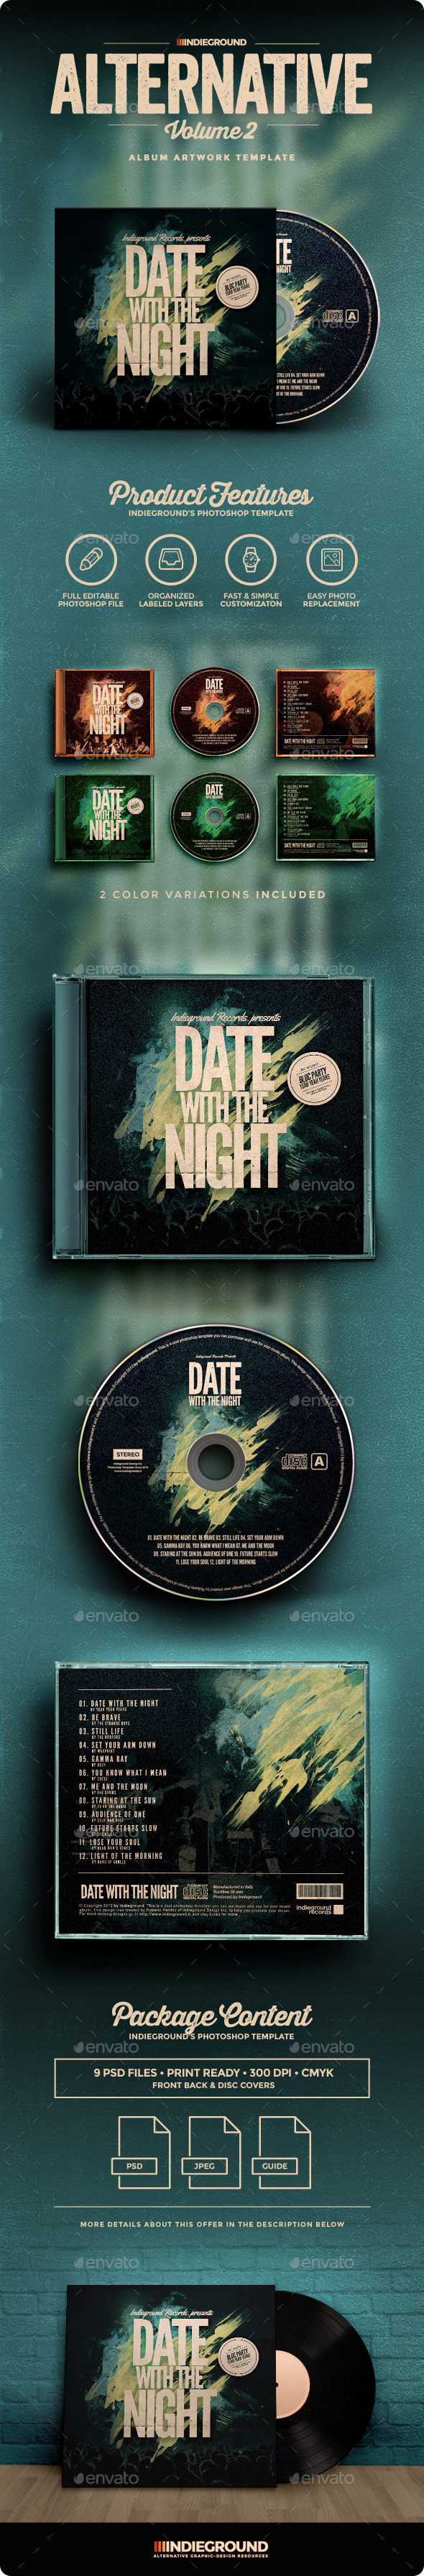 Alternative CD Album Artwork Vol 2